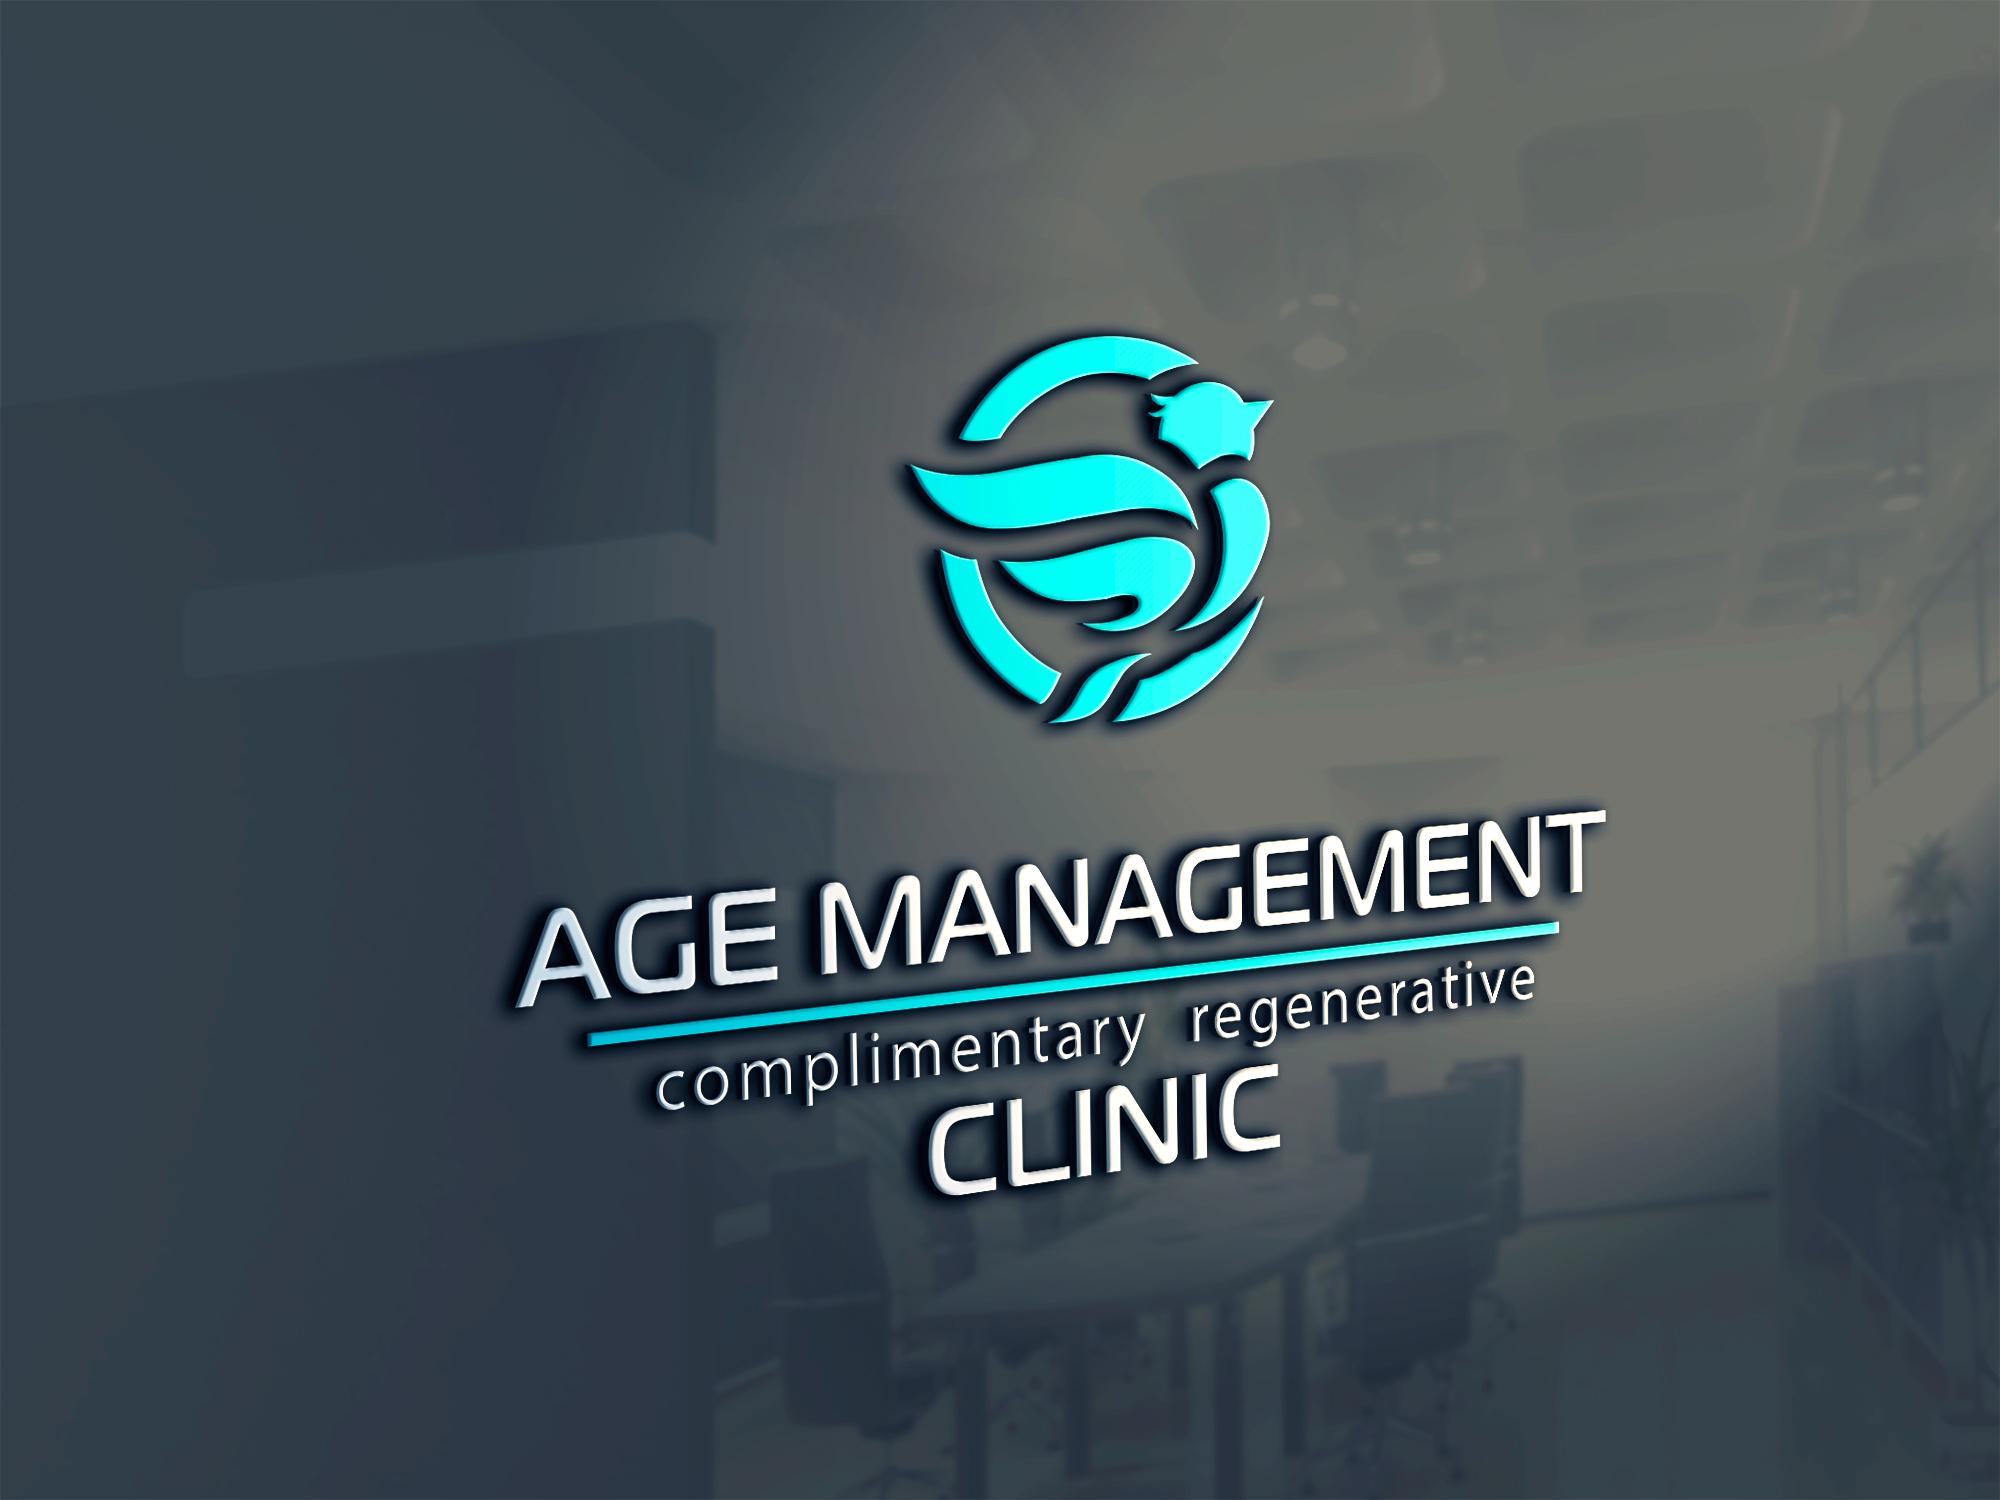 Логотип для медицинского центра (клиники)  фото f_1695ba1626f6109e.jpg